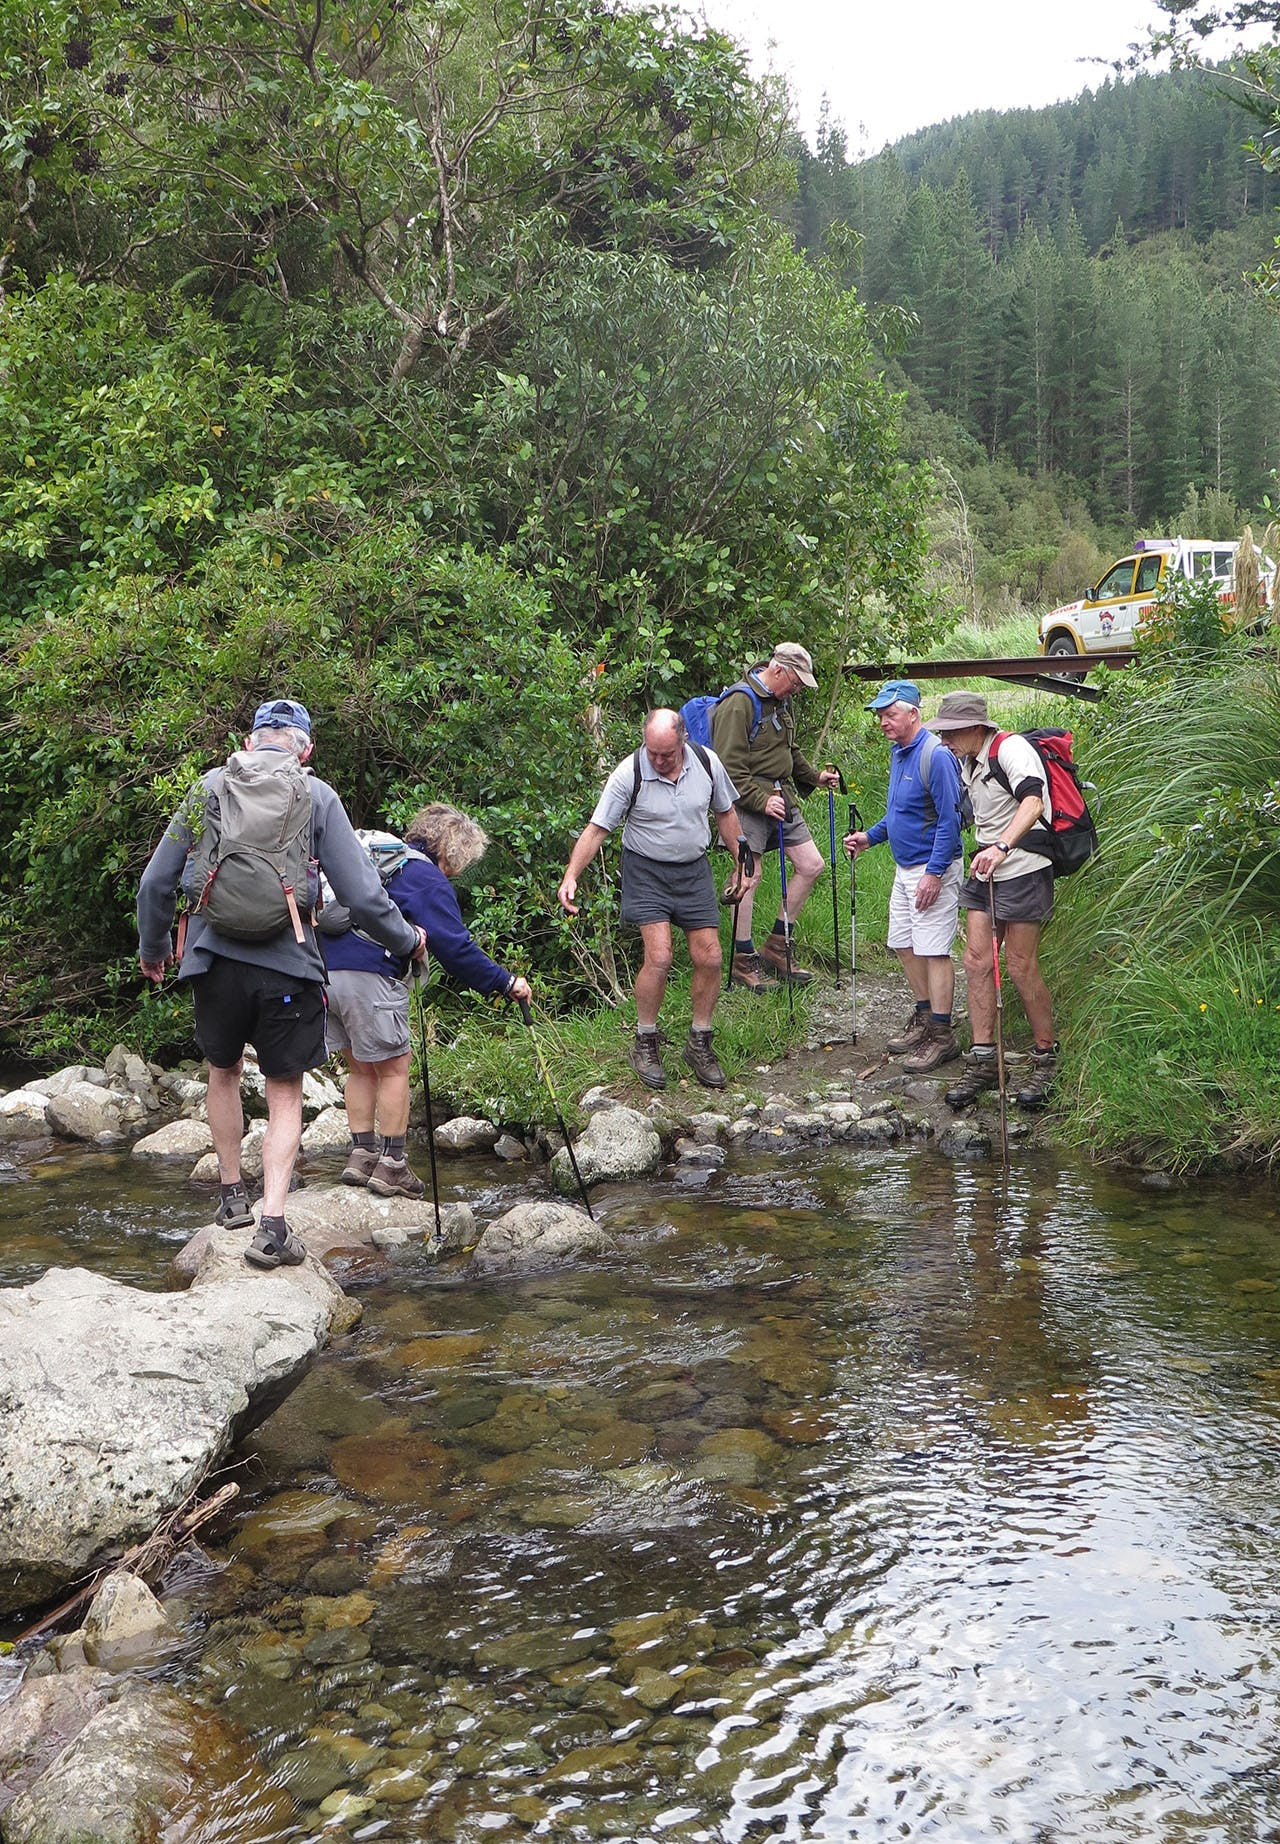 Crossing Makakahi Stream. Photo: Mike Cole